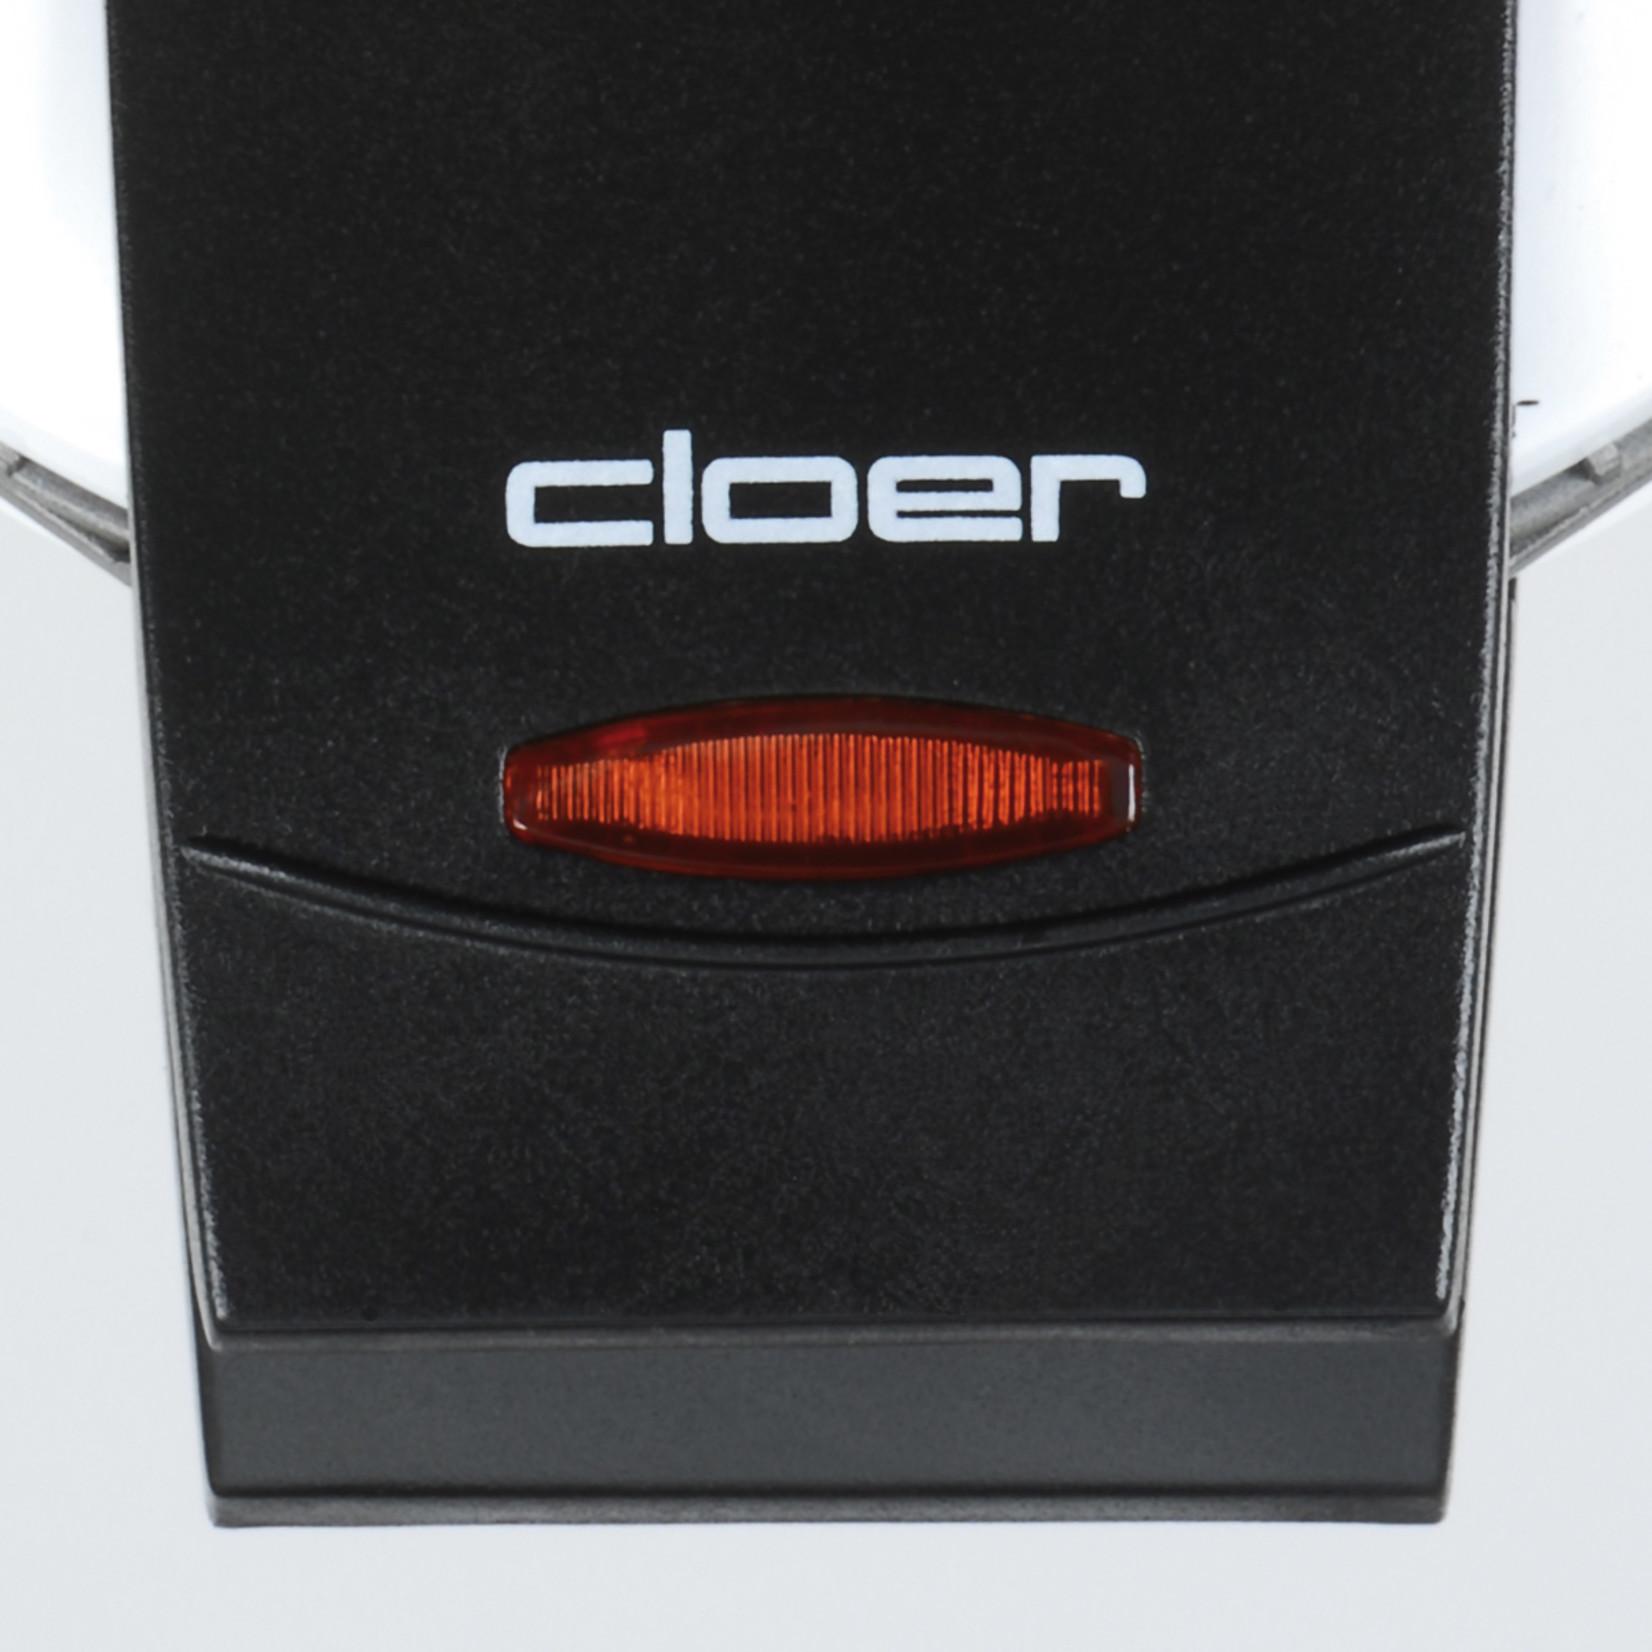 Cloer Cloer oublie-/kniepertjes ijzer 260